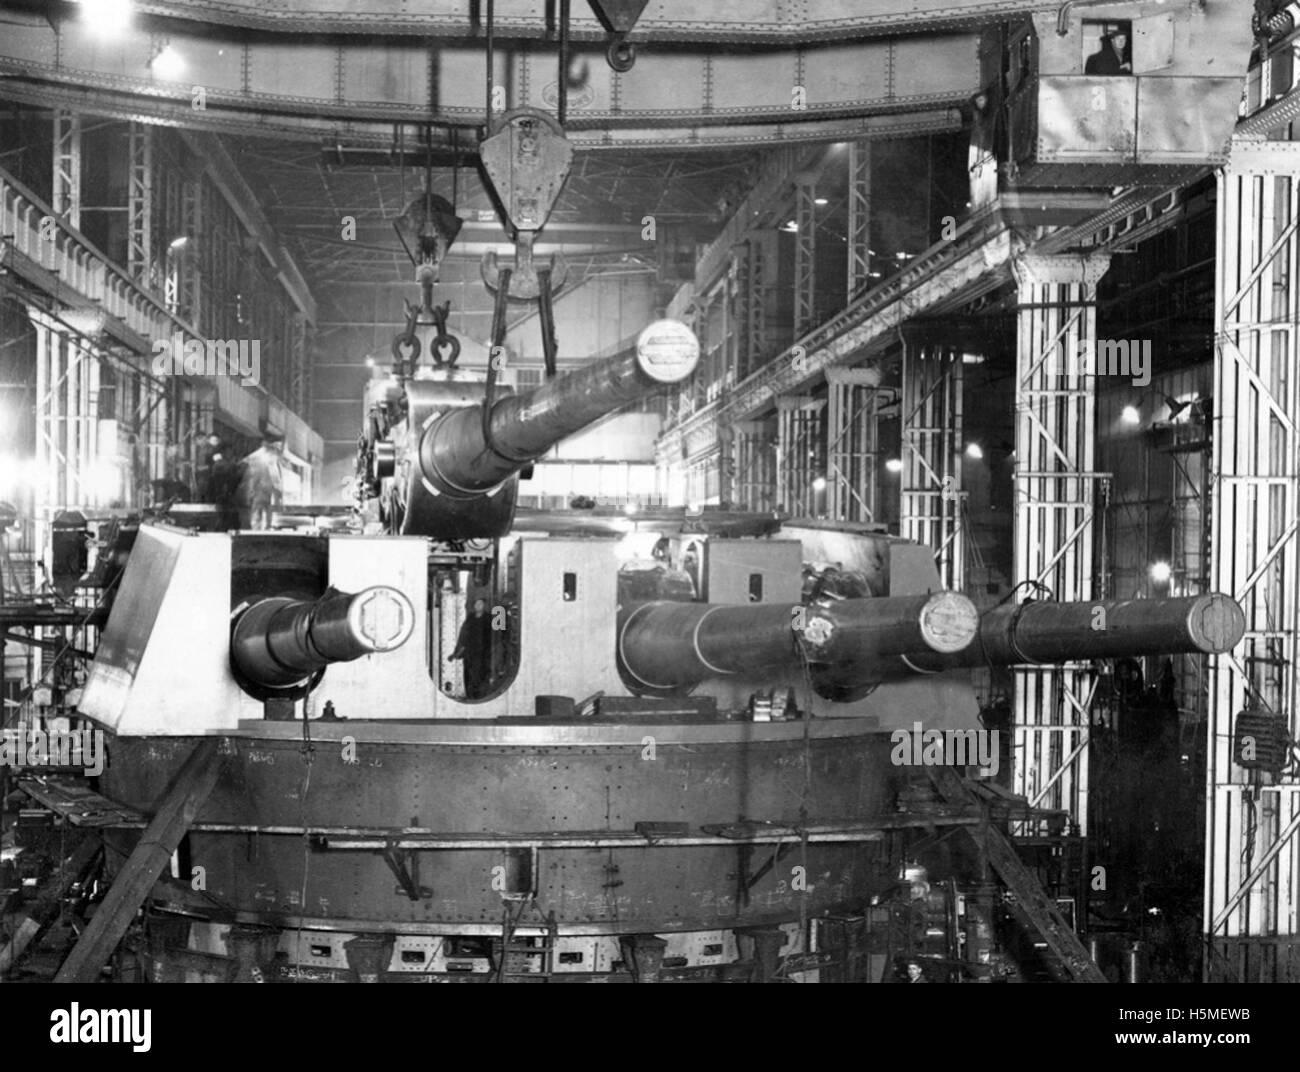 Quadruple gun mounting in 24 Shop, Elswick Works Stock Photo